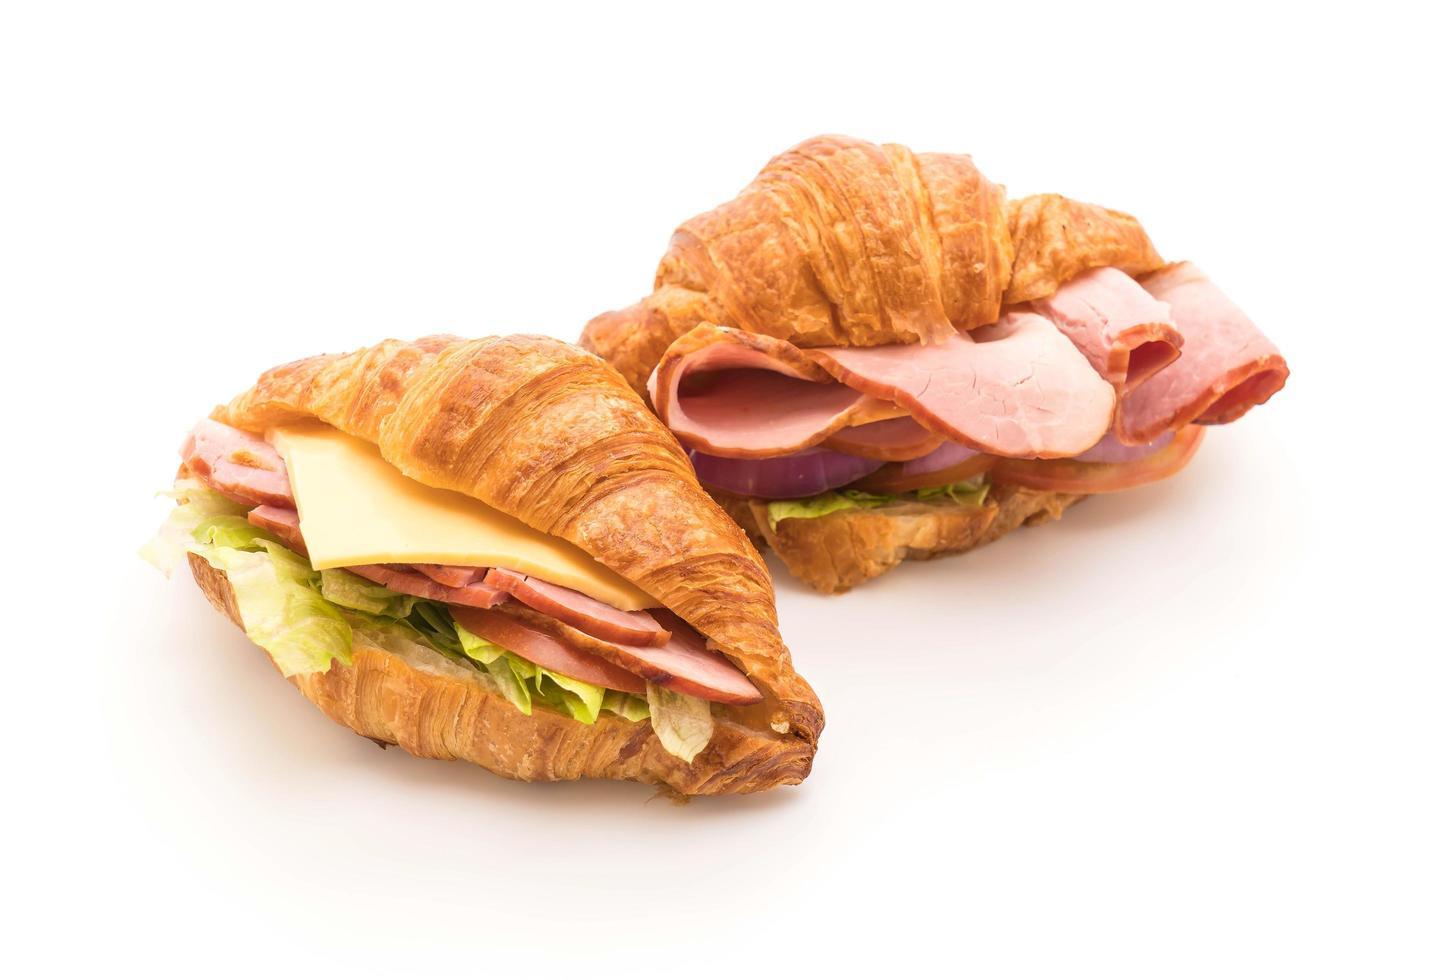 Sándwiches de jamón croissant sobre fondo blanco. foto